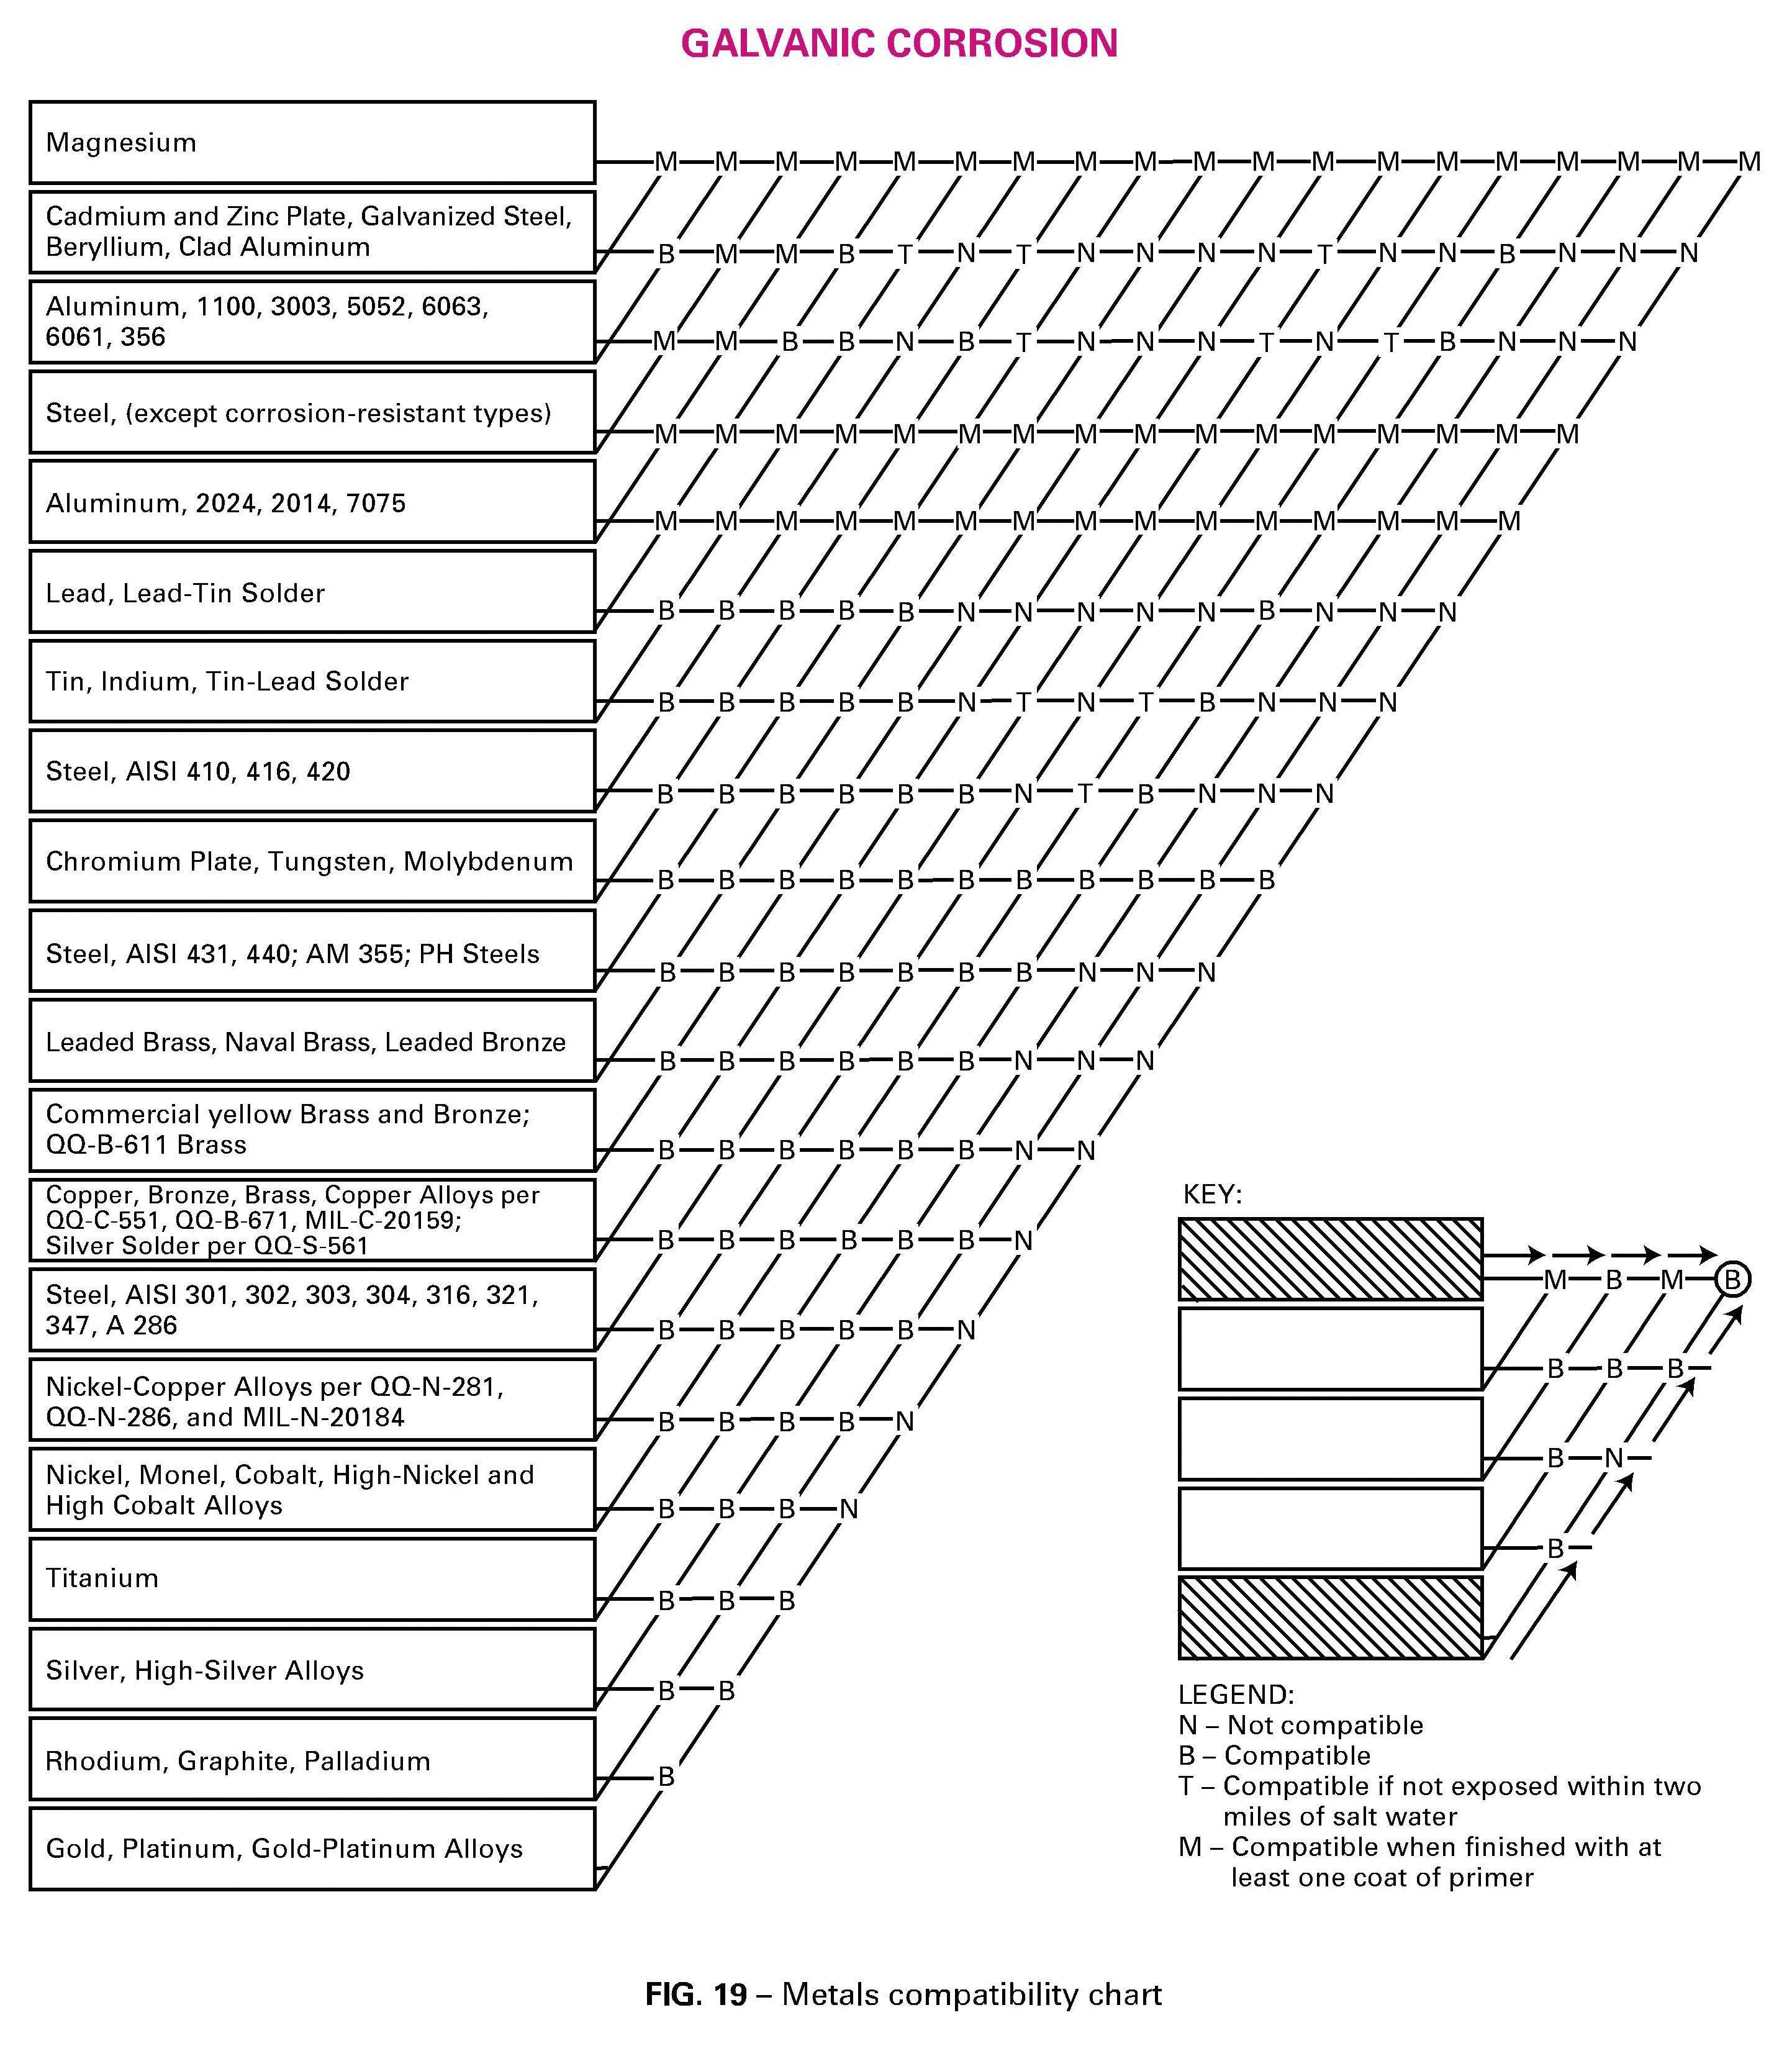 Corrosion Galvanica Useful Resources